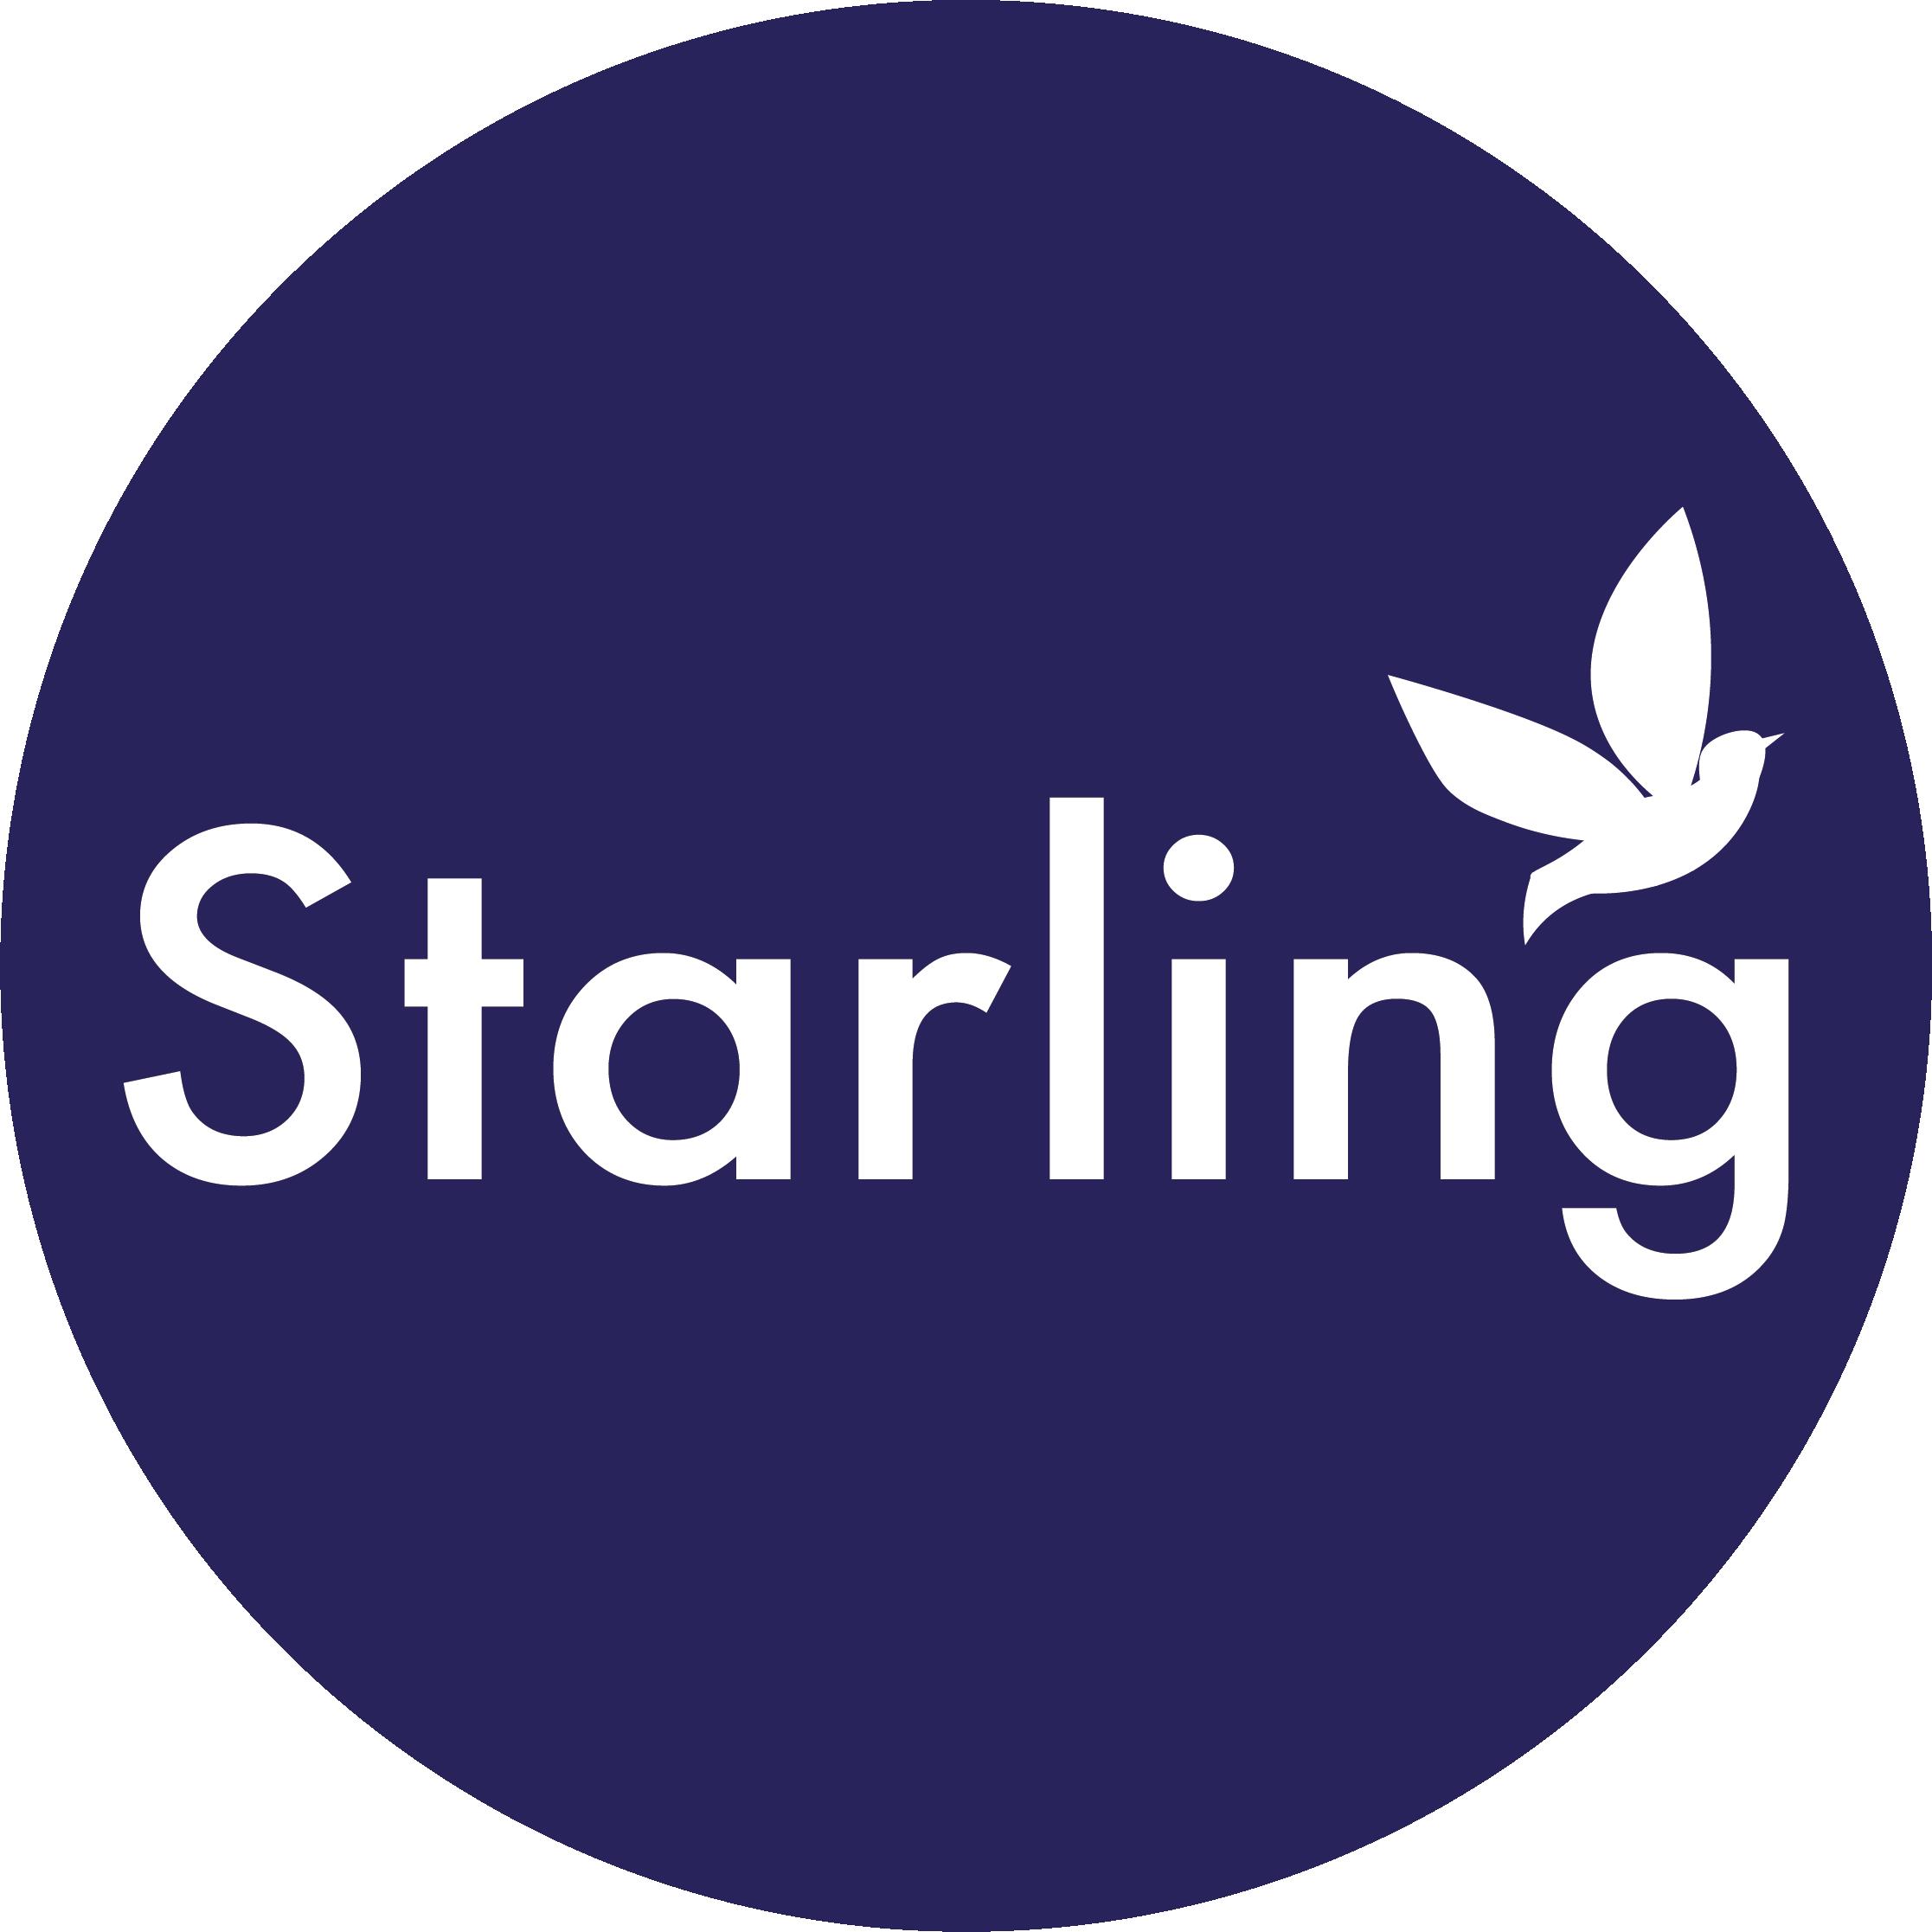 Starling cio